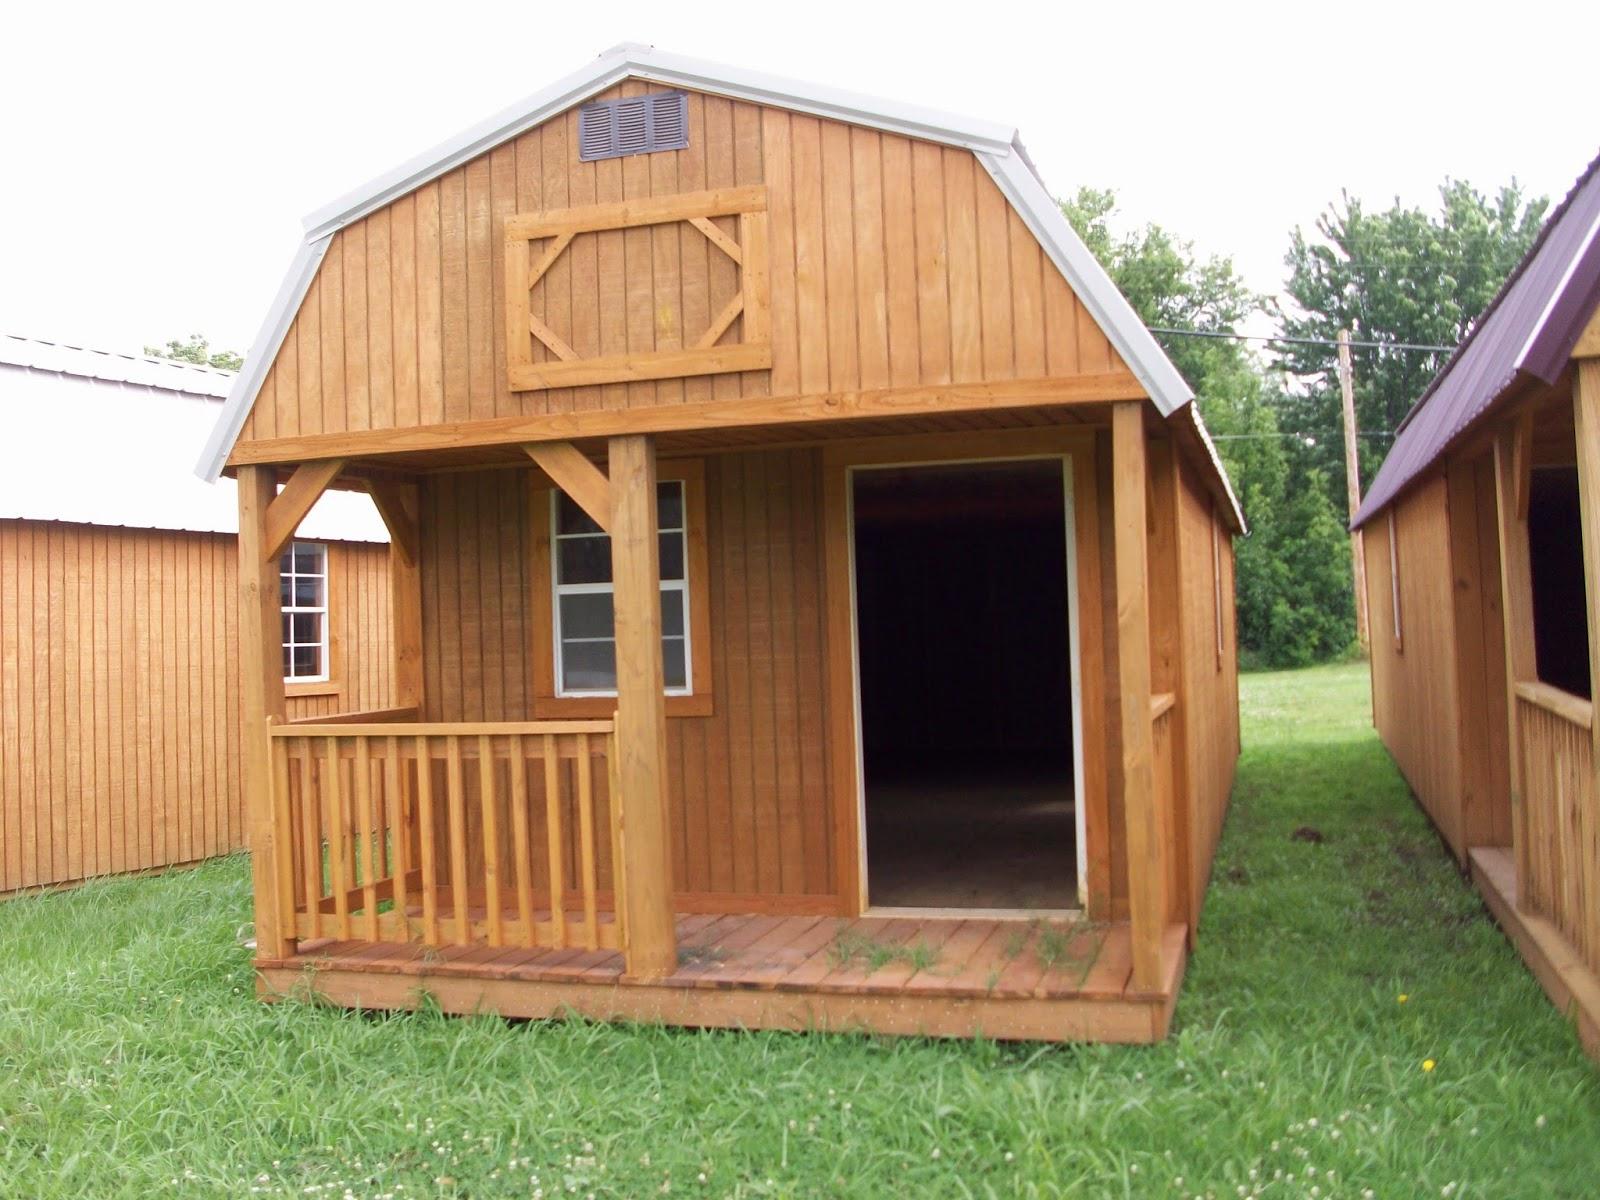 Tiny House Homestead: Meet the Shedroom